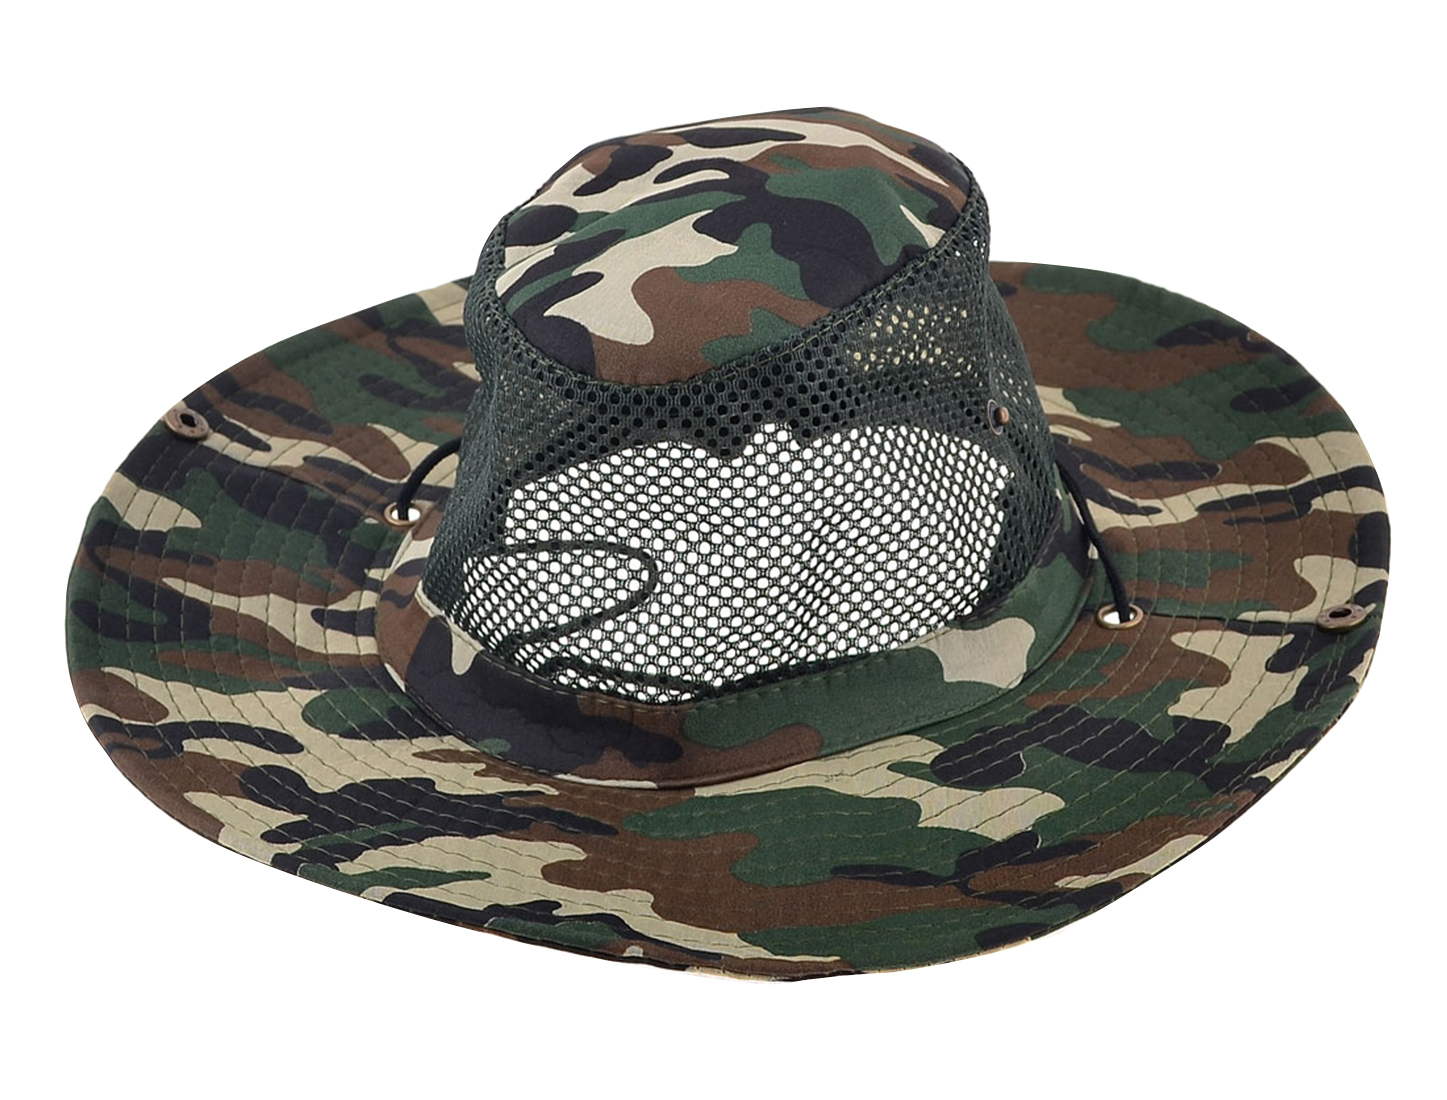 Men Mesh Design Top Camouflage Pattern Angling Fishing Hat Cap Army Green